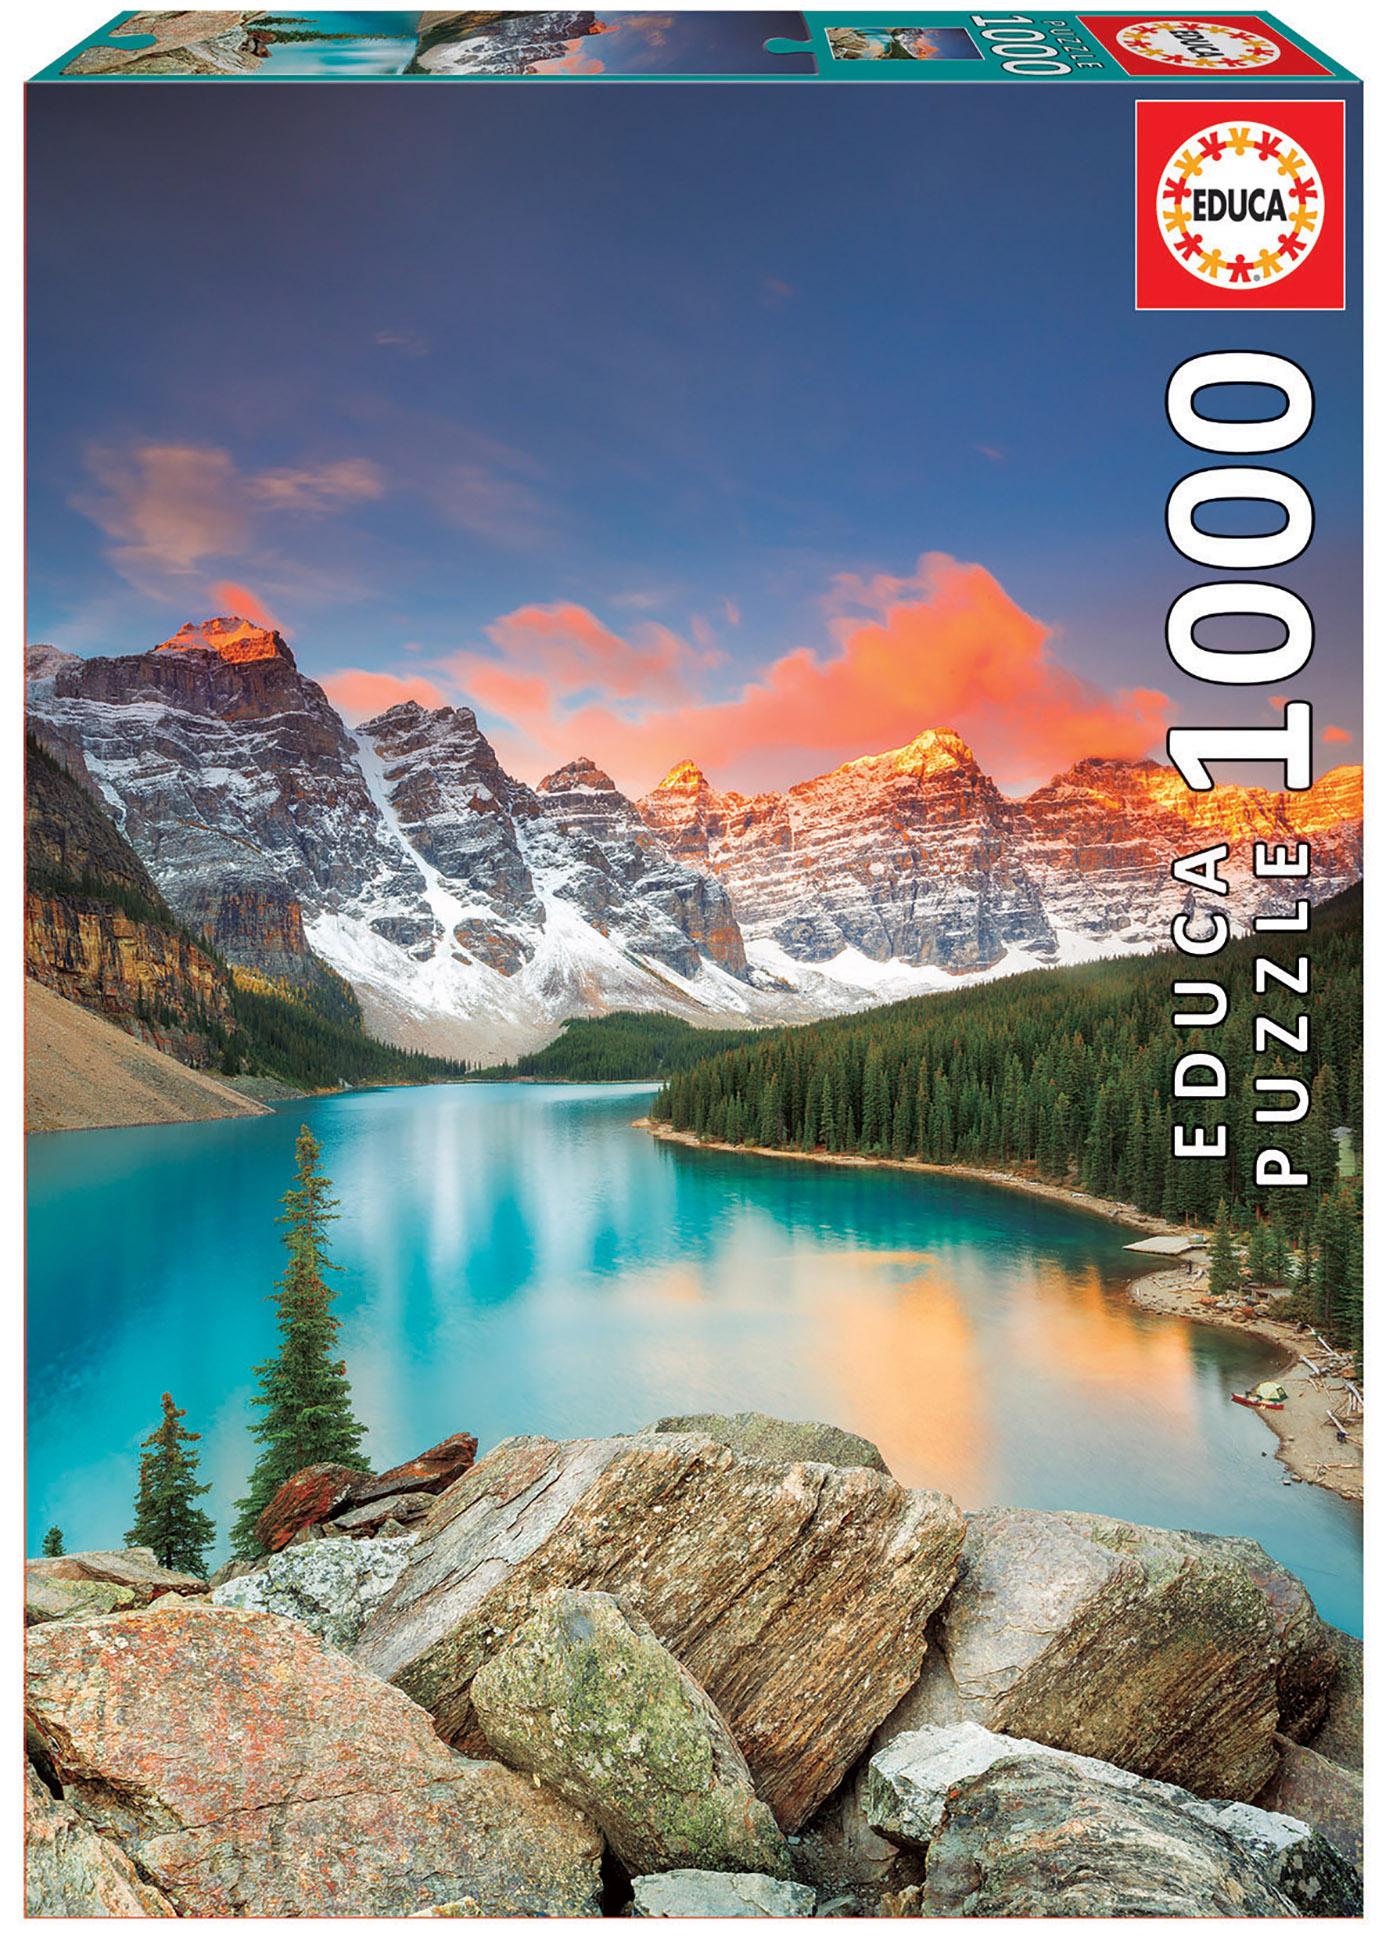 1000 Lac Moraine, Banff National Park, Canada